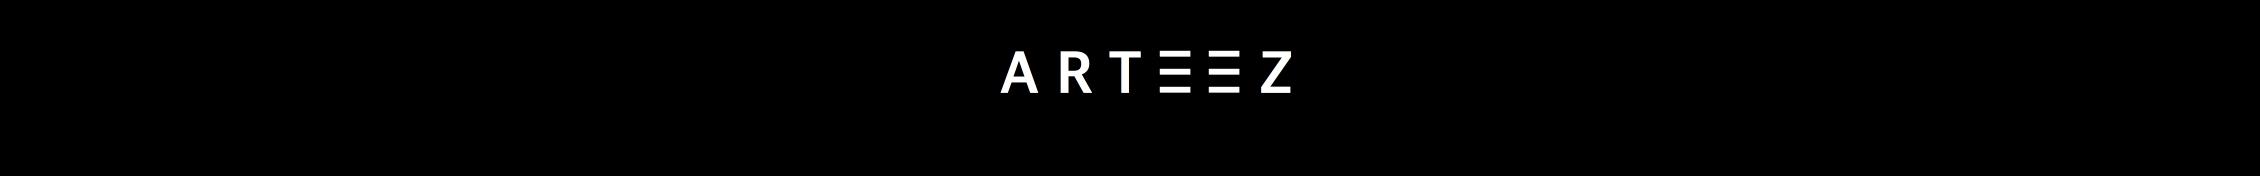 ArteezMagazine_logo_fondnoir_lettresbanches